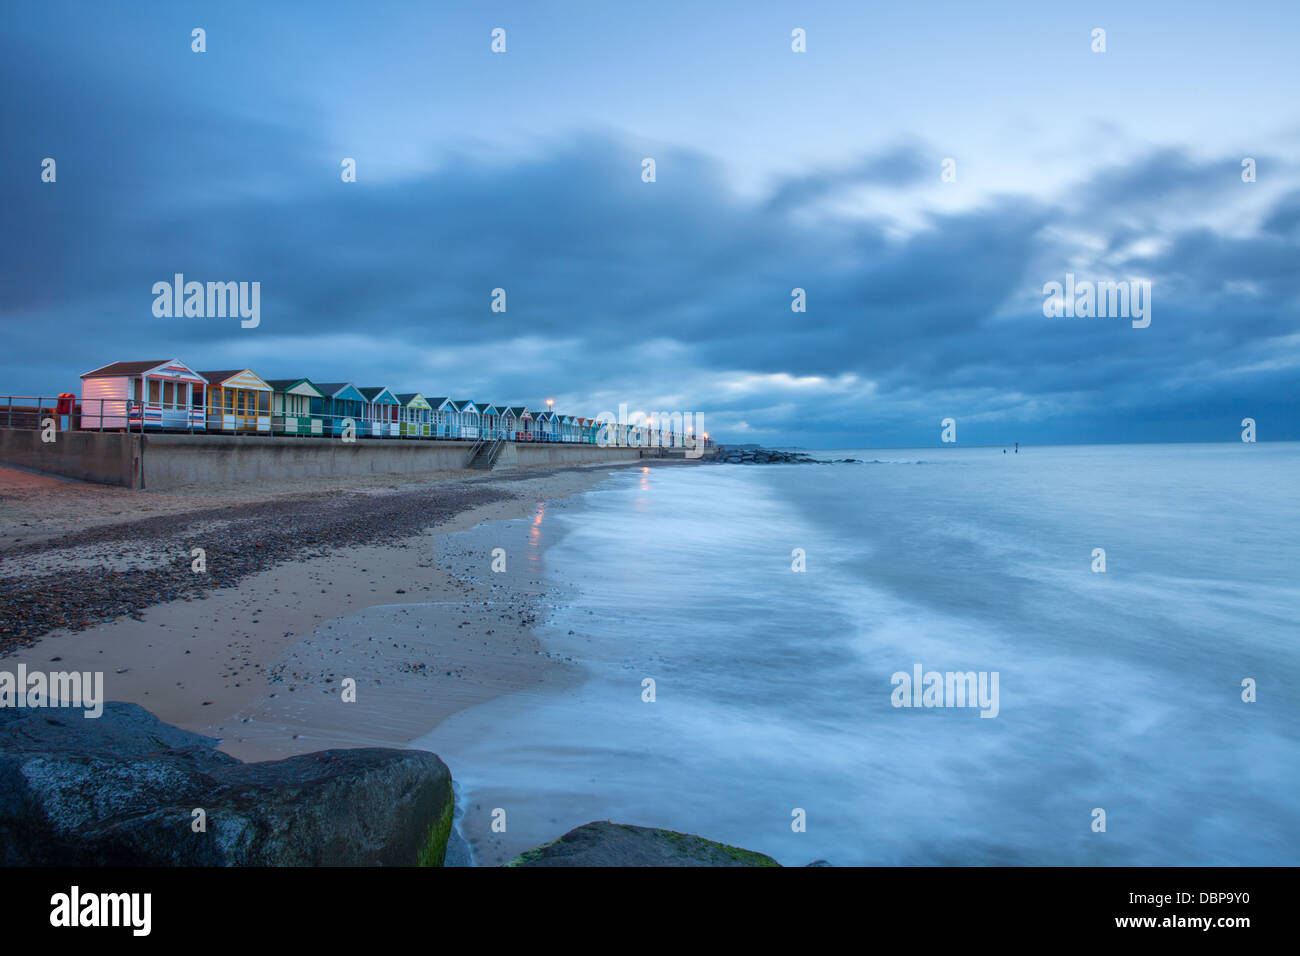 Beach waves and beach huts on promenade Southwold, Suffolk, UK - Stock Image